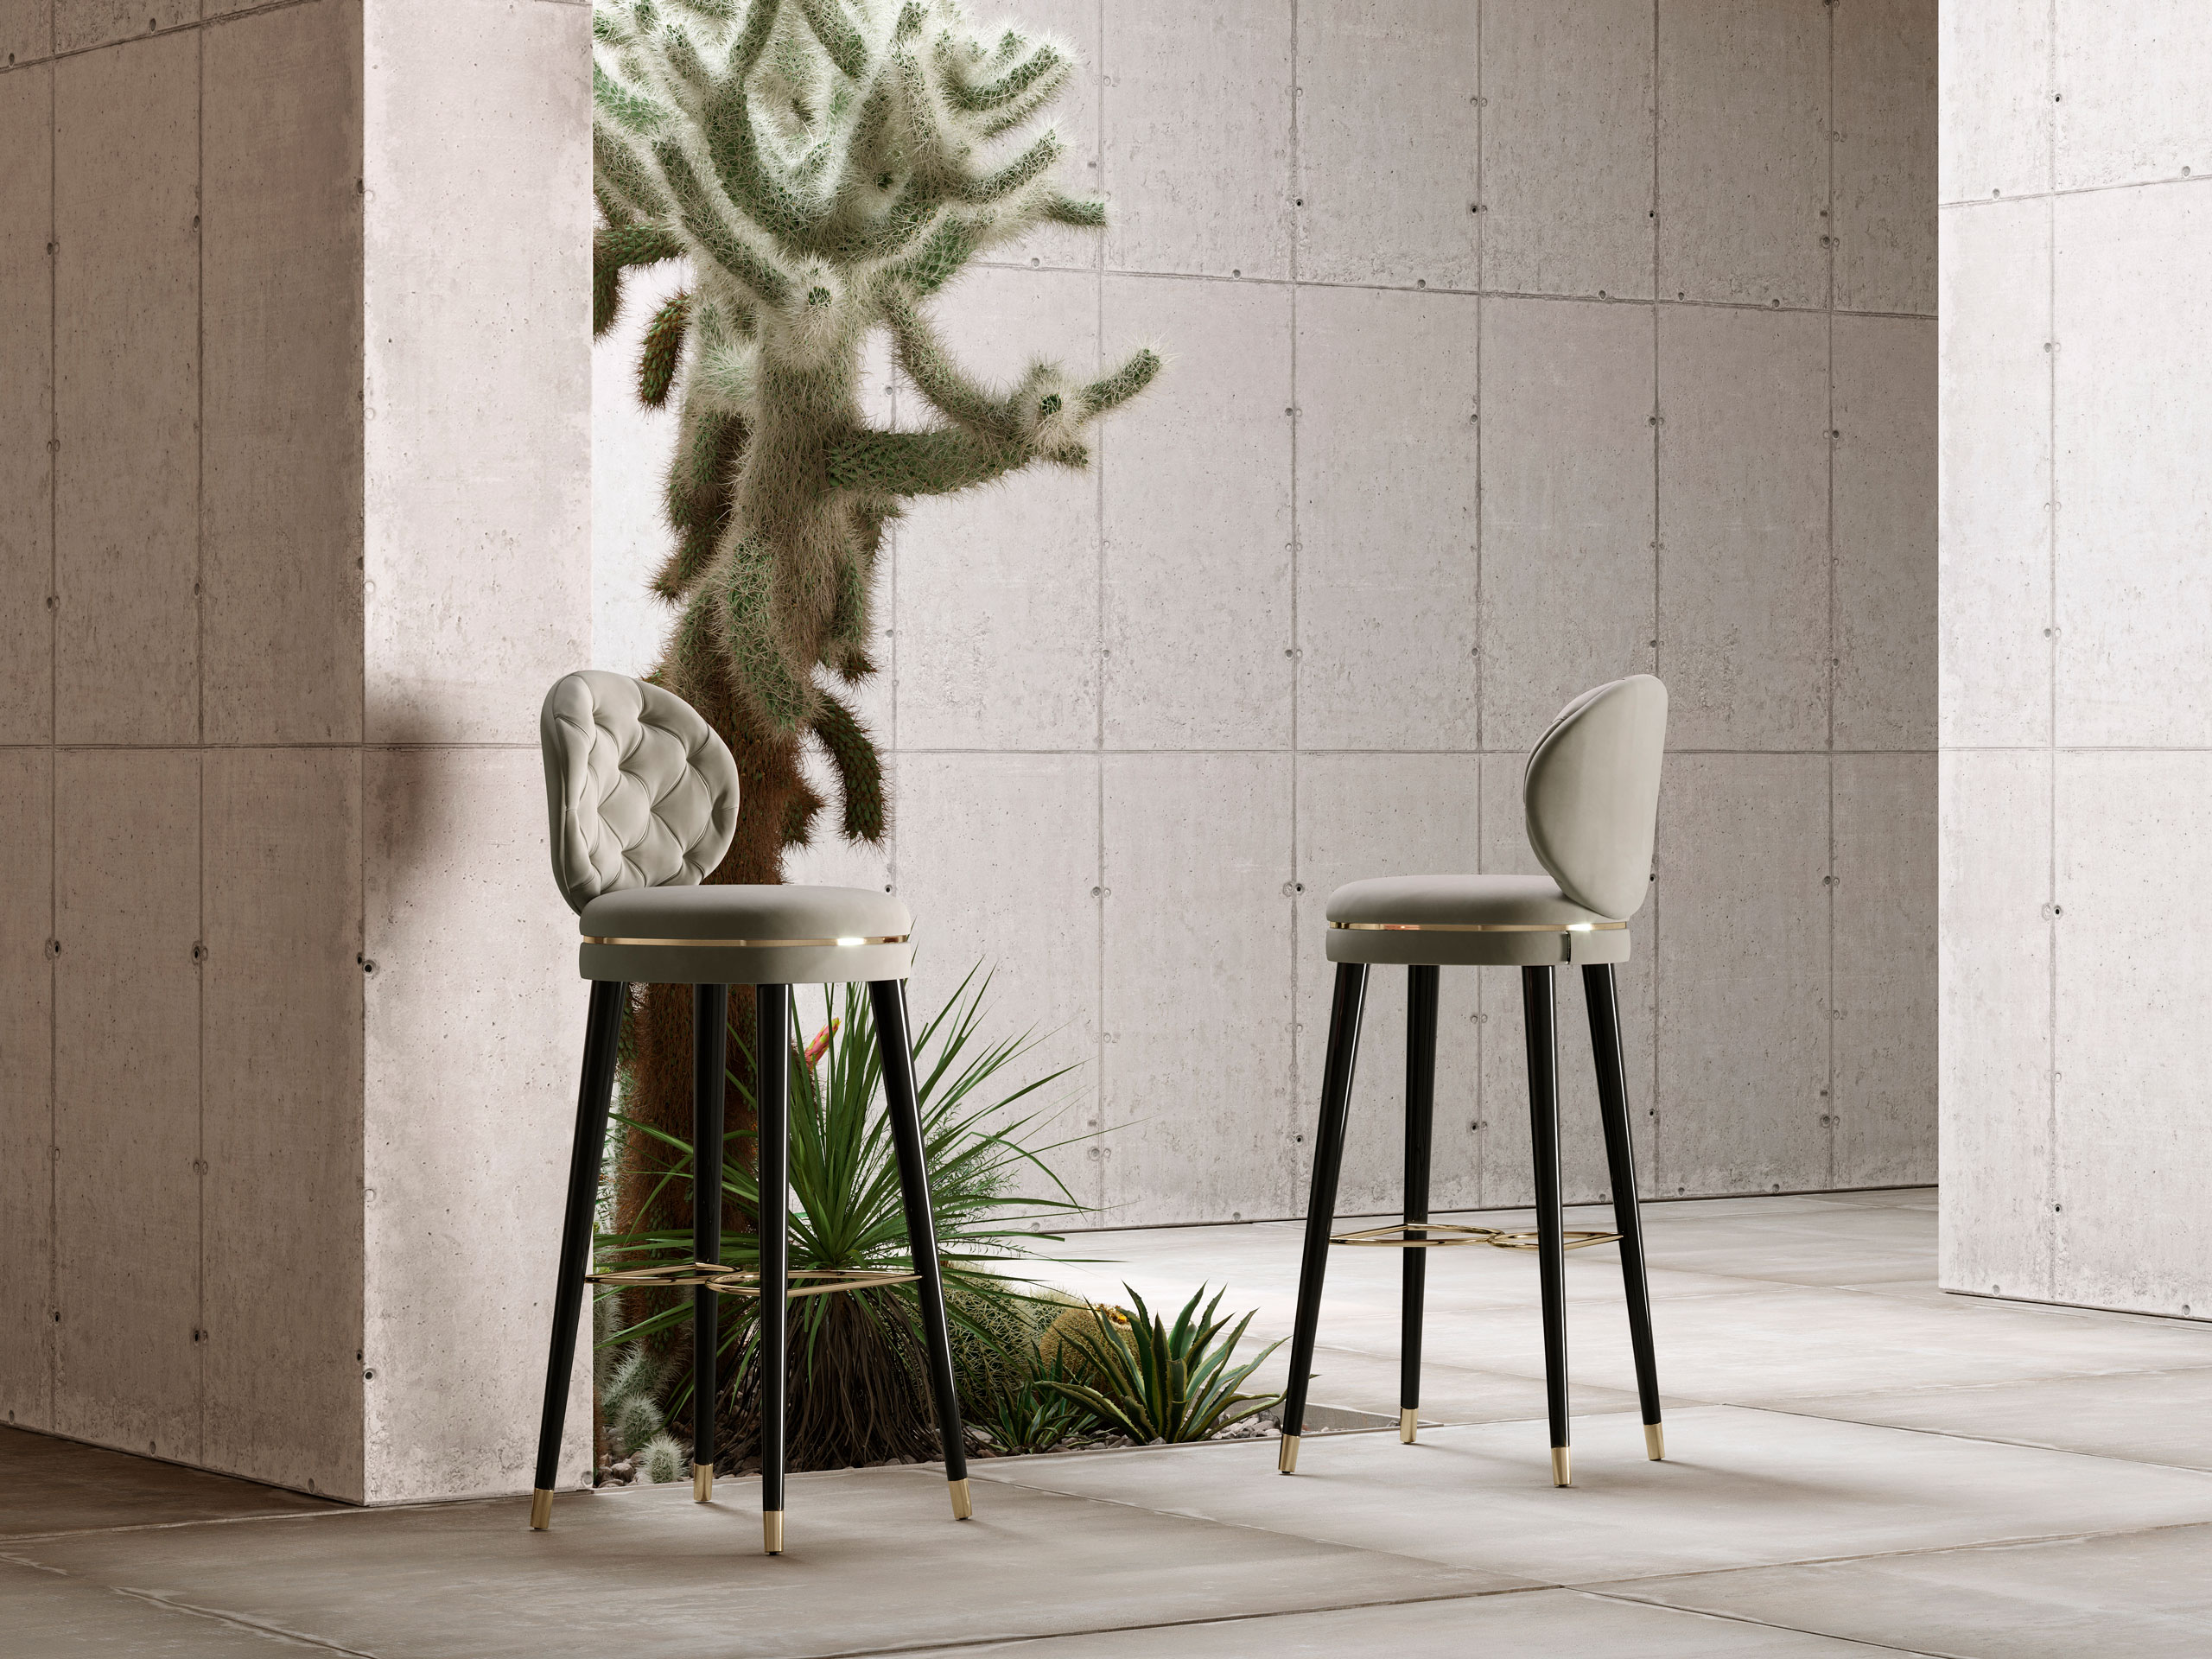 katy-bar-chair-domkapa-new-collection-2021-dining-room-decor-1